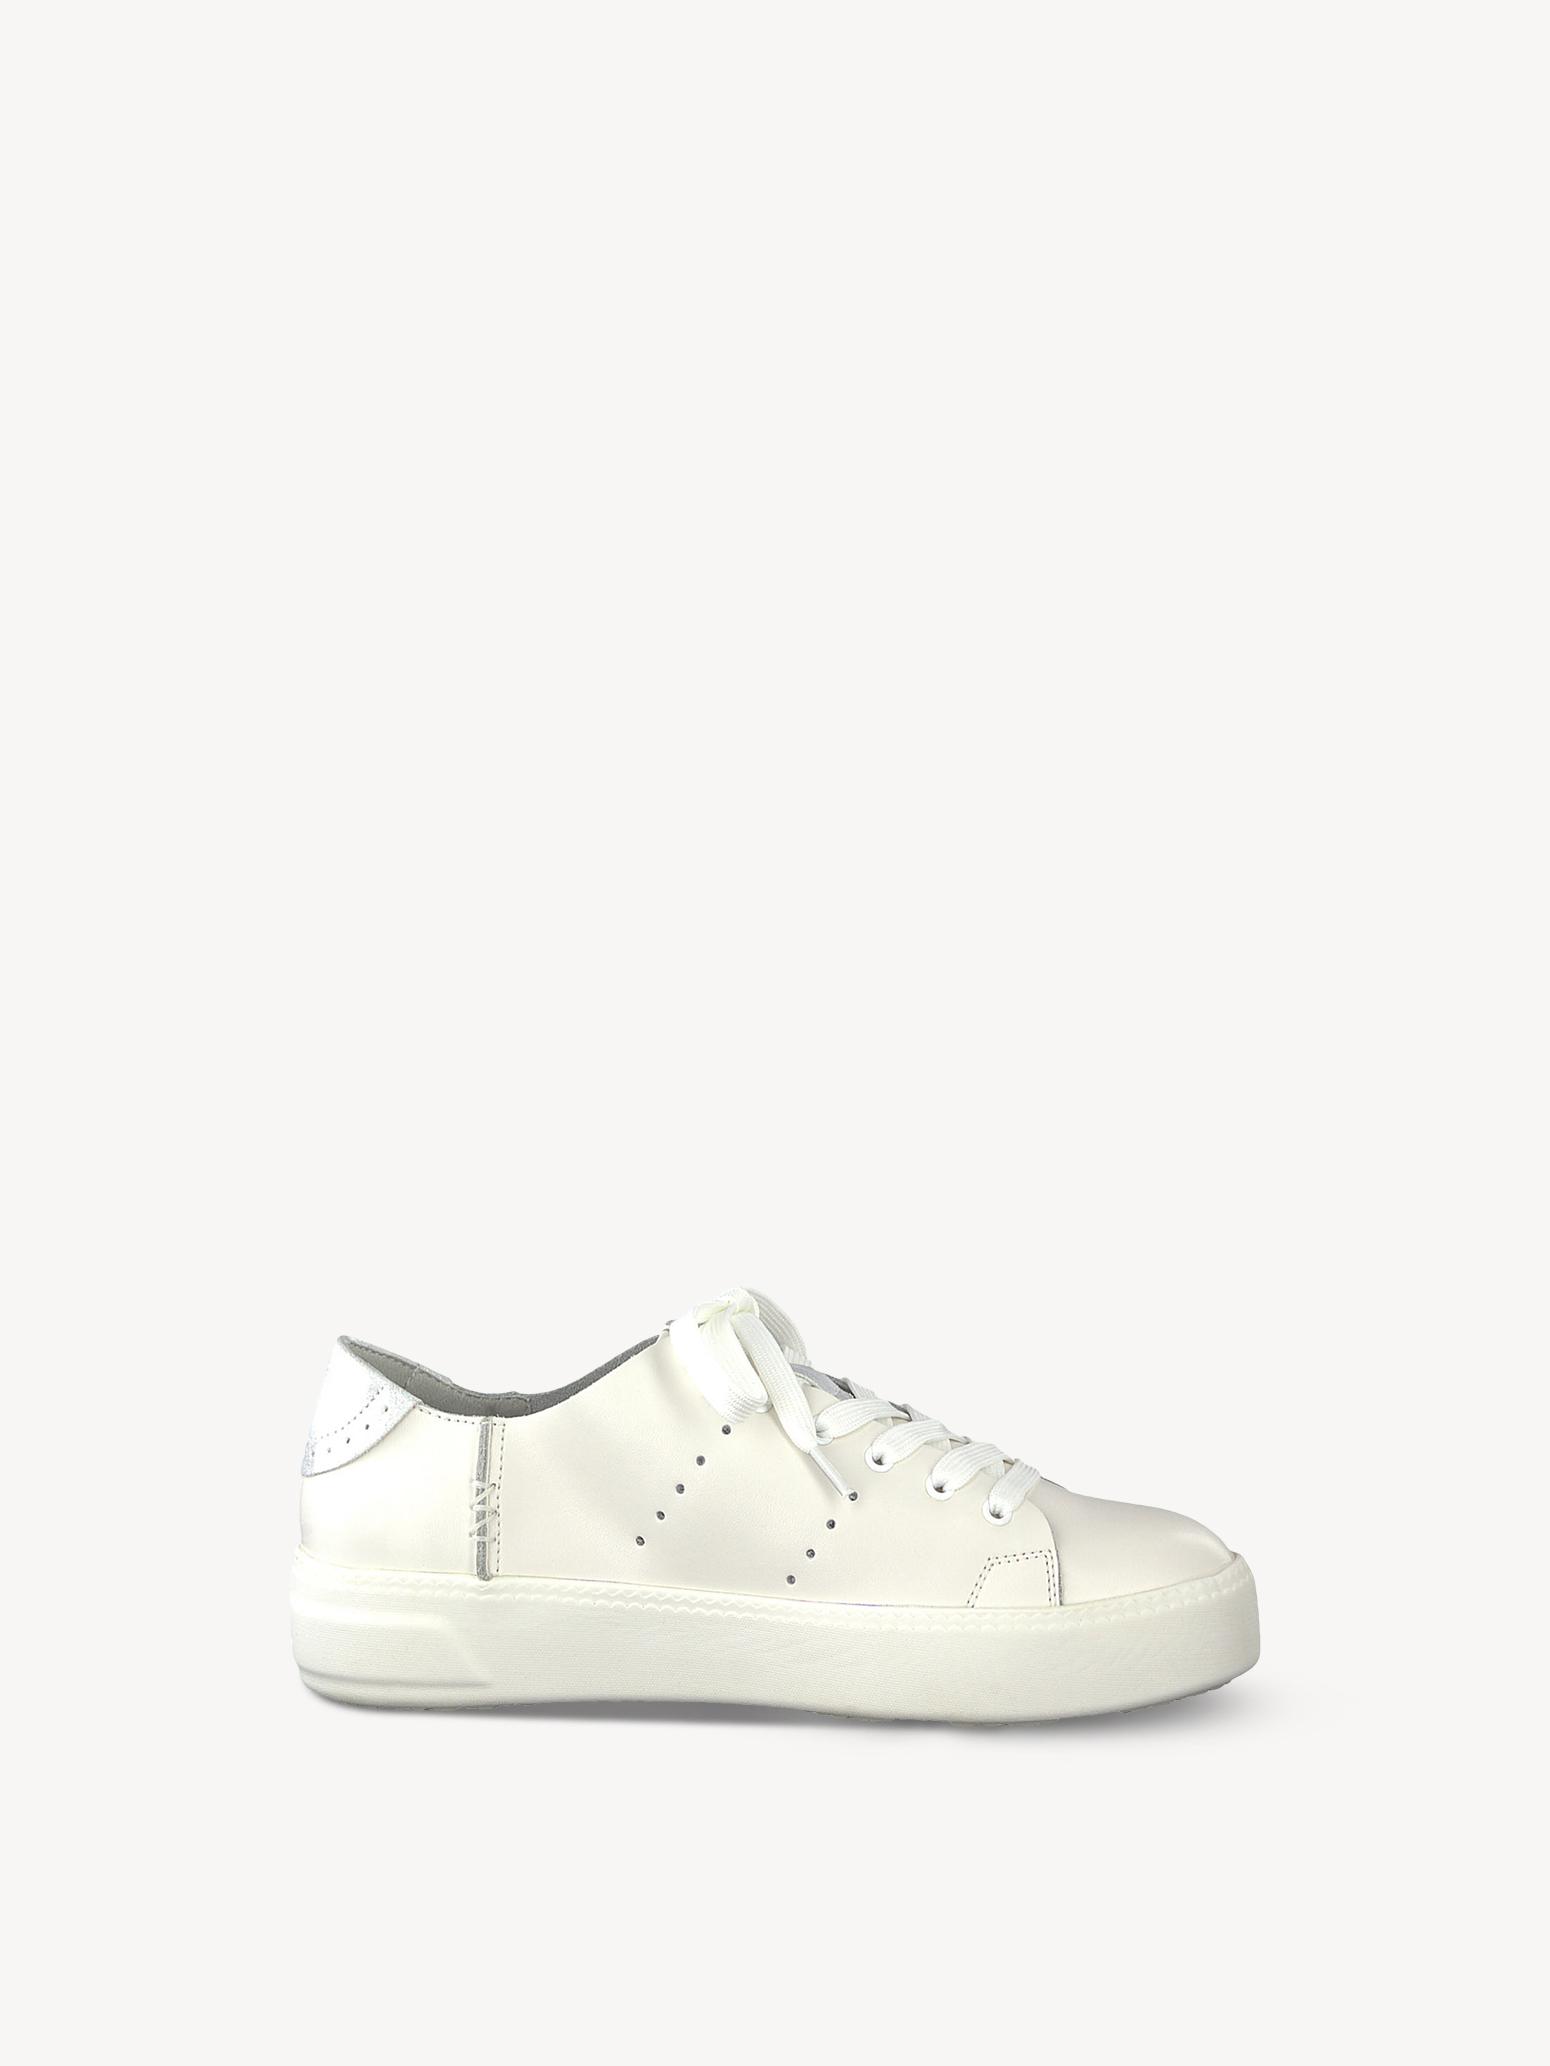 Tamaris Milania Sneaker weiß | elbandi